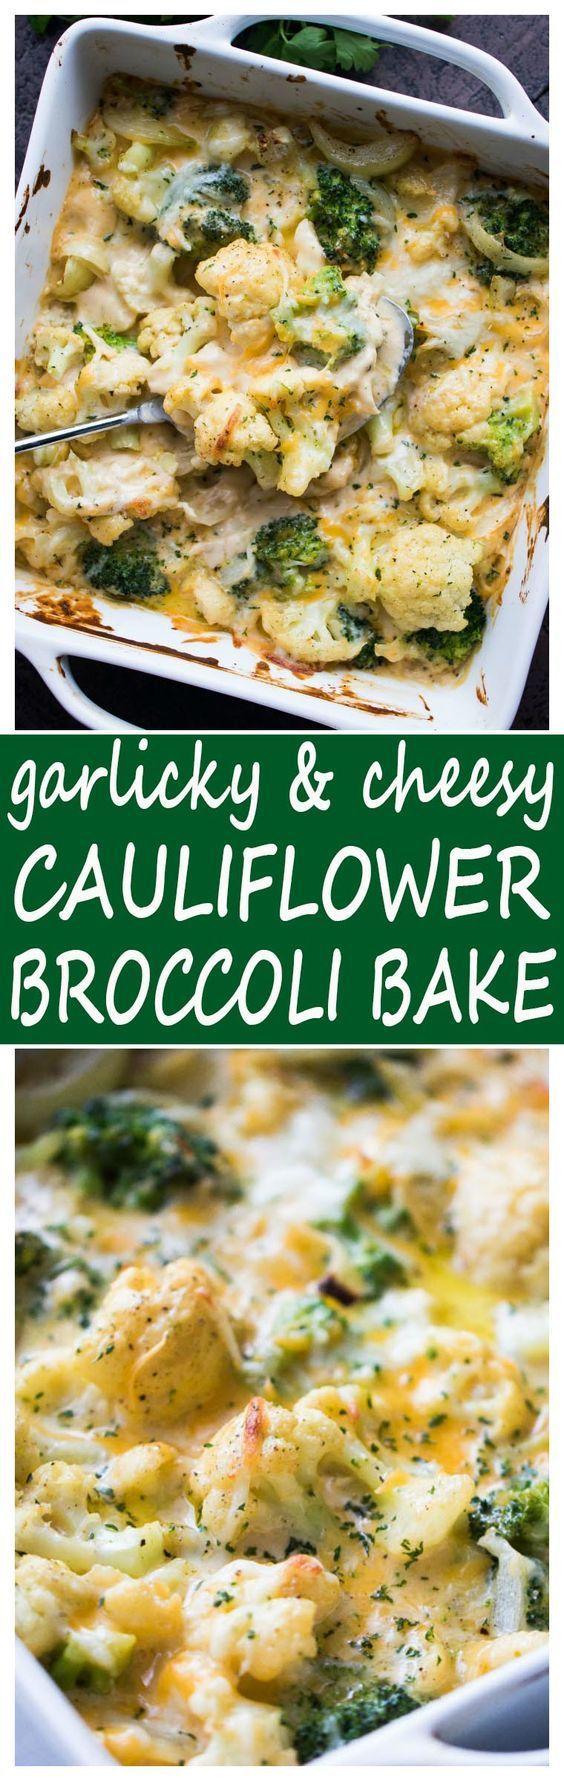 Garlicky and Cheesy Cauliflower Broccoli Bake – A lighter version of everyone's favorite rich and cheesy cauliflower broccoli bake! Or is it casserole? Gratin? Whatevs, it's still so darn good!